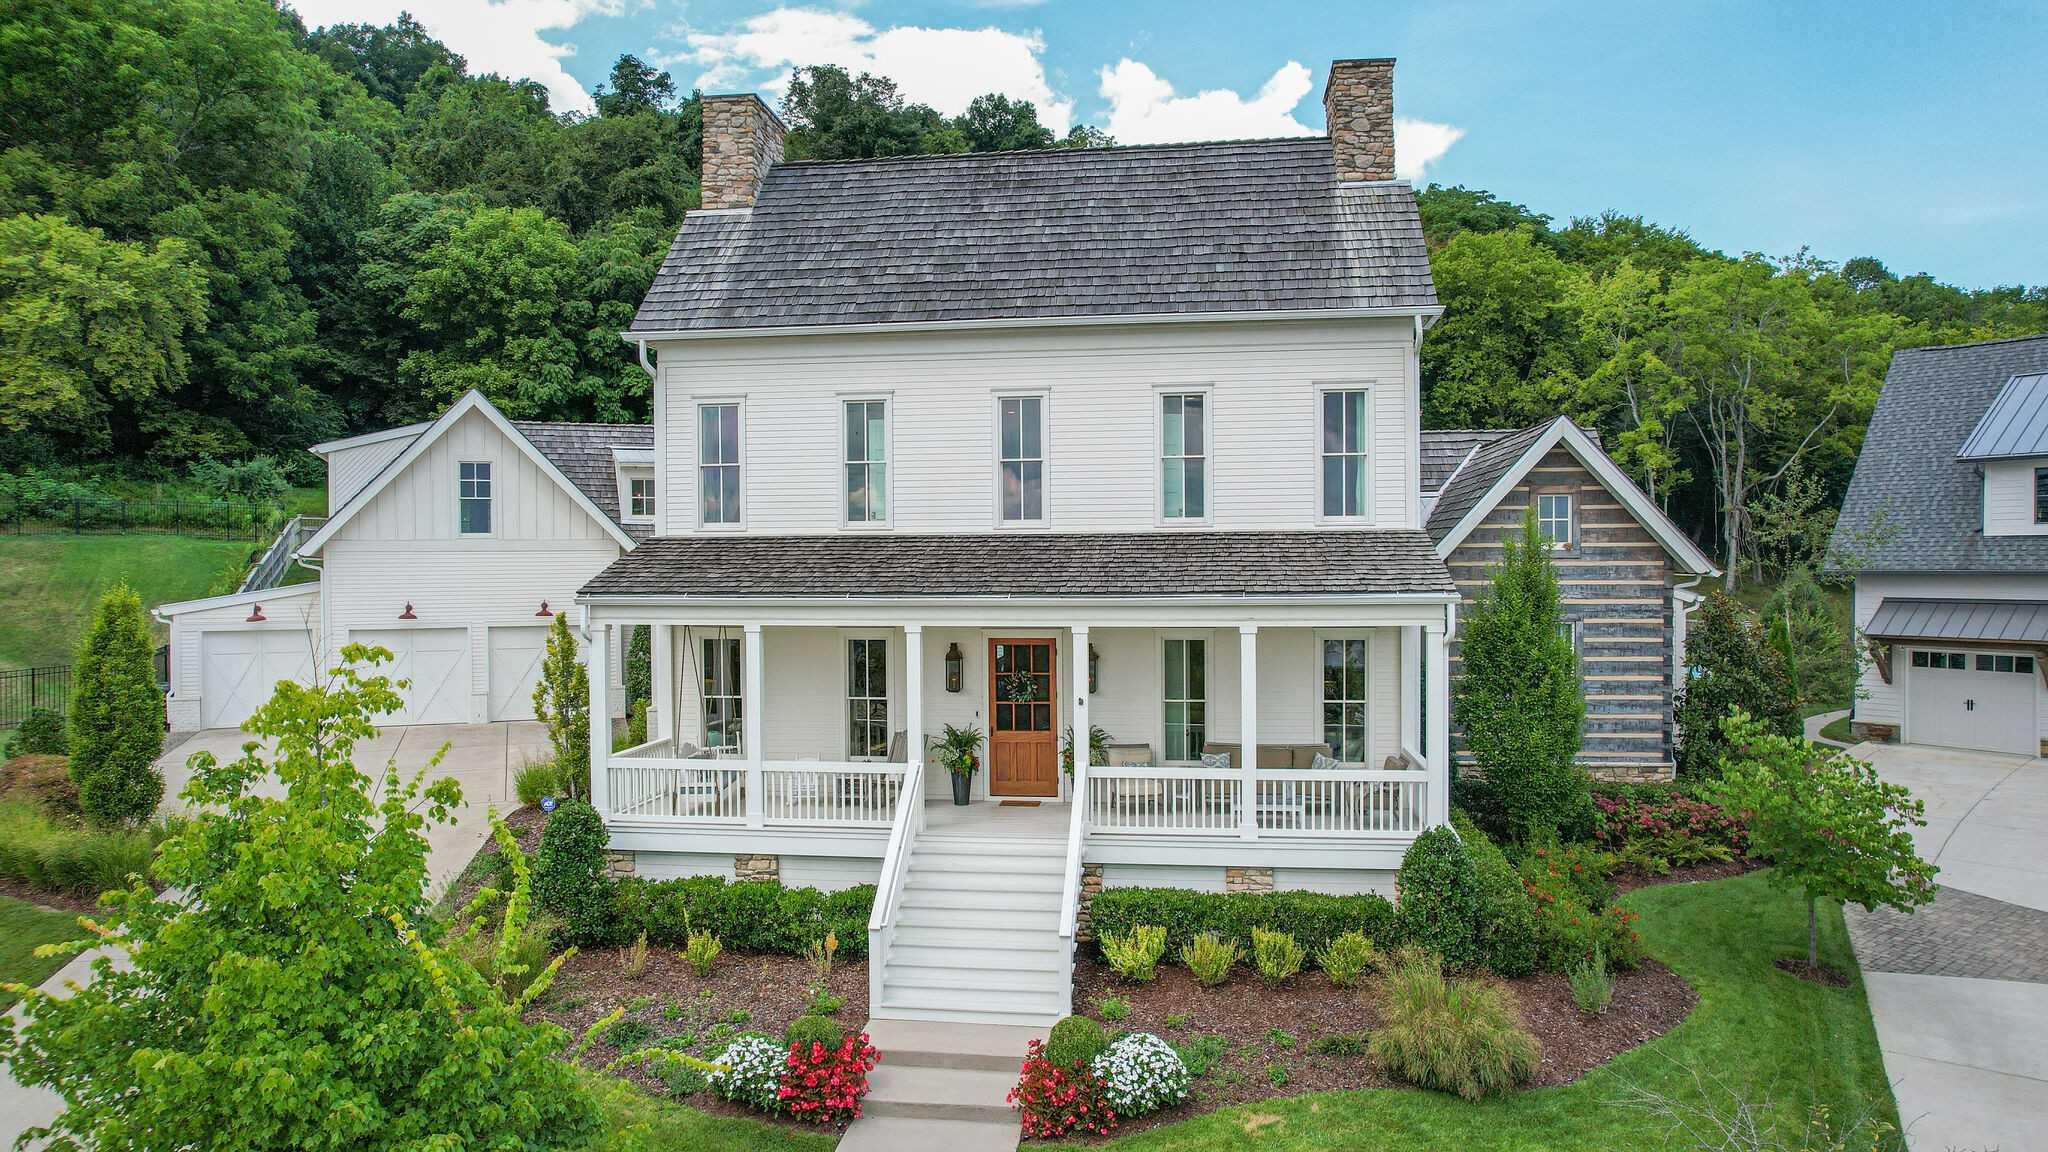 $3,750,000 - 5Br/8Ba -  for Sale in Westhaven Sec30, Franklin